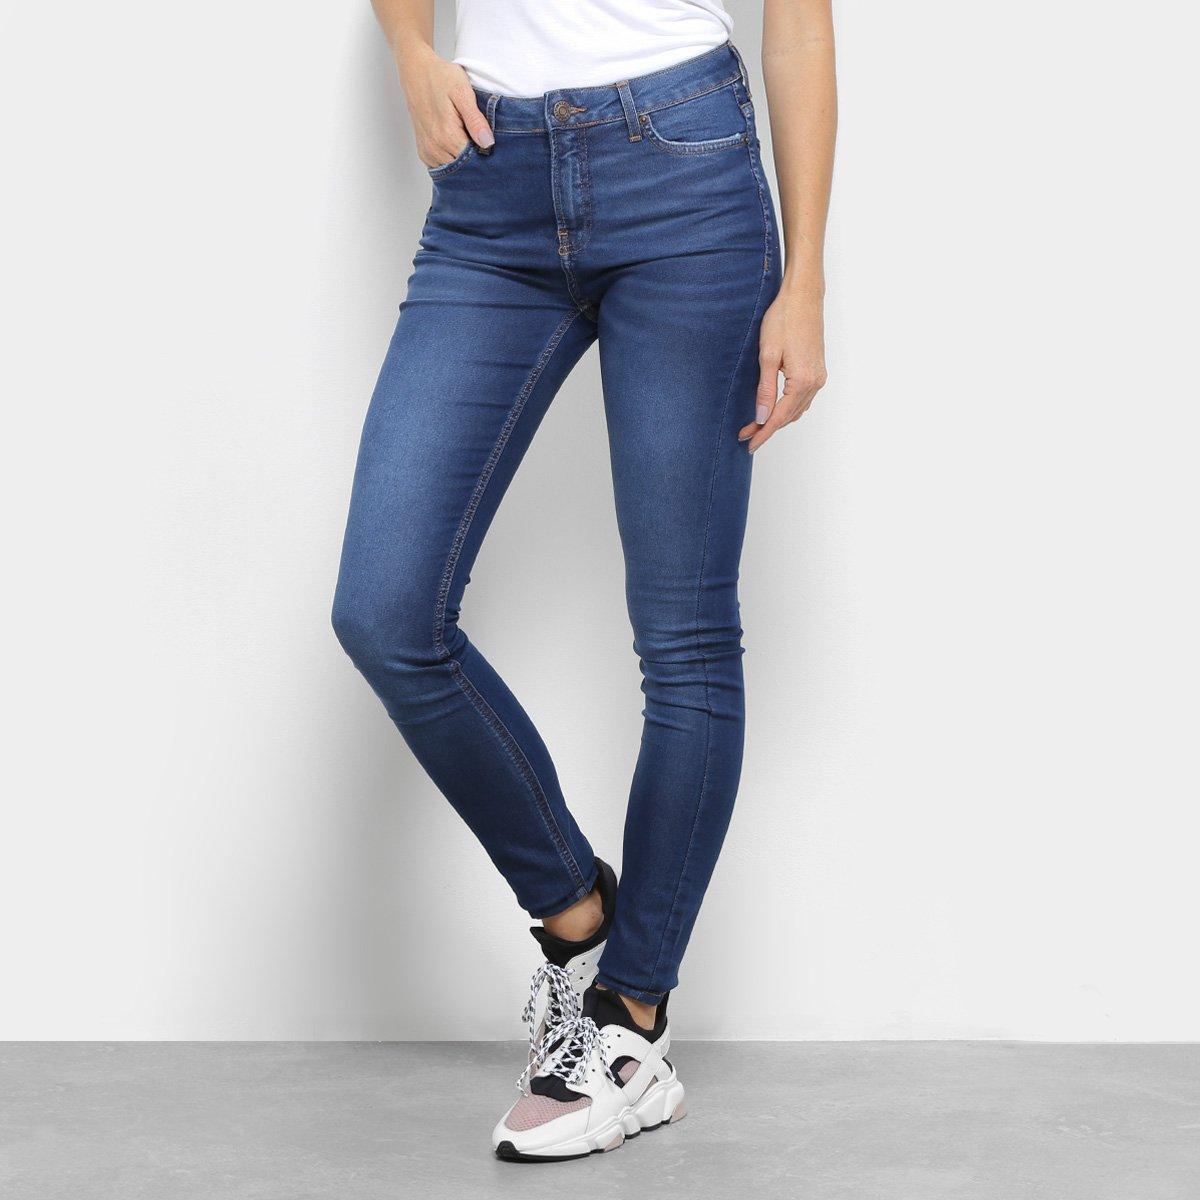 Calça Jeans Skinny Calvin Klein Five Pockets Duper Feminina - Azul ... 4fba2404ea